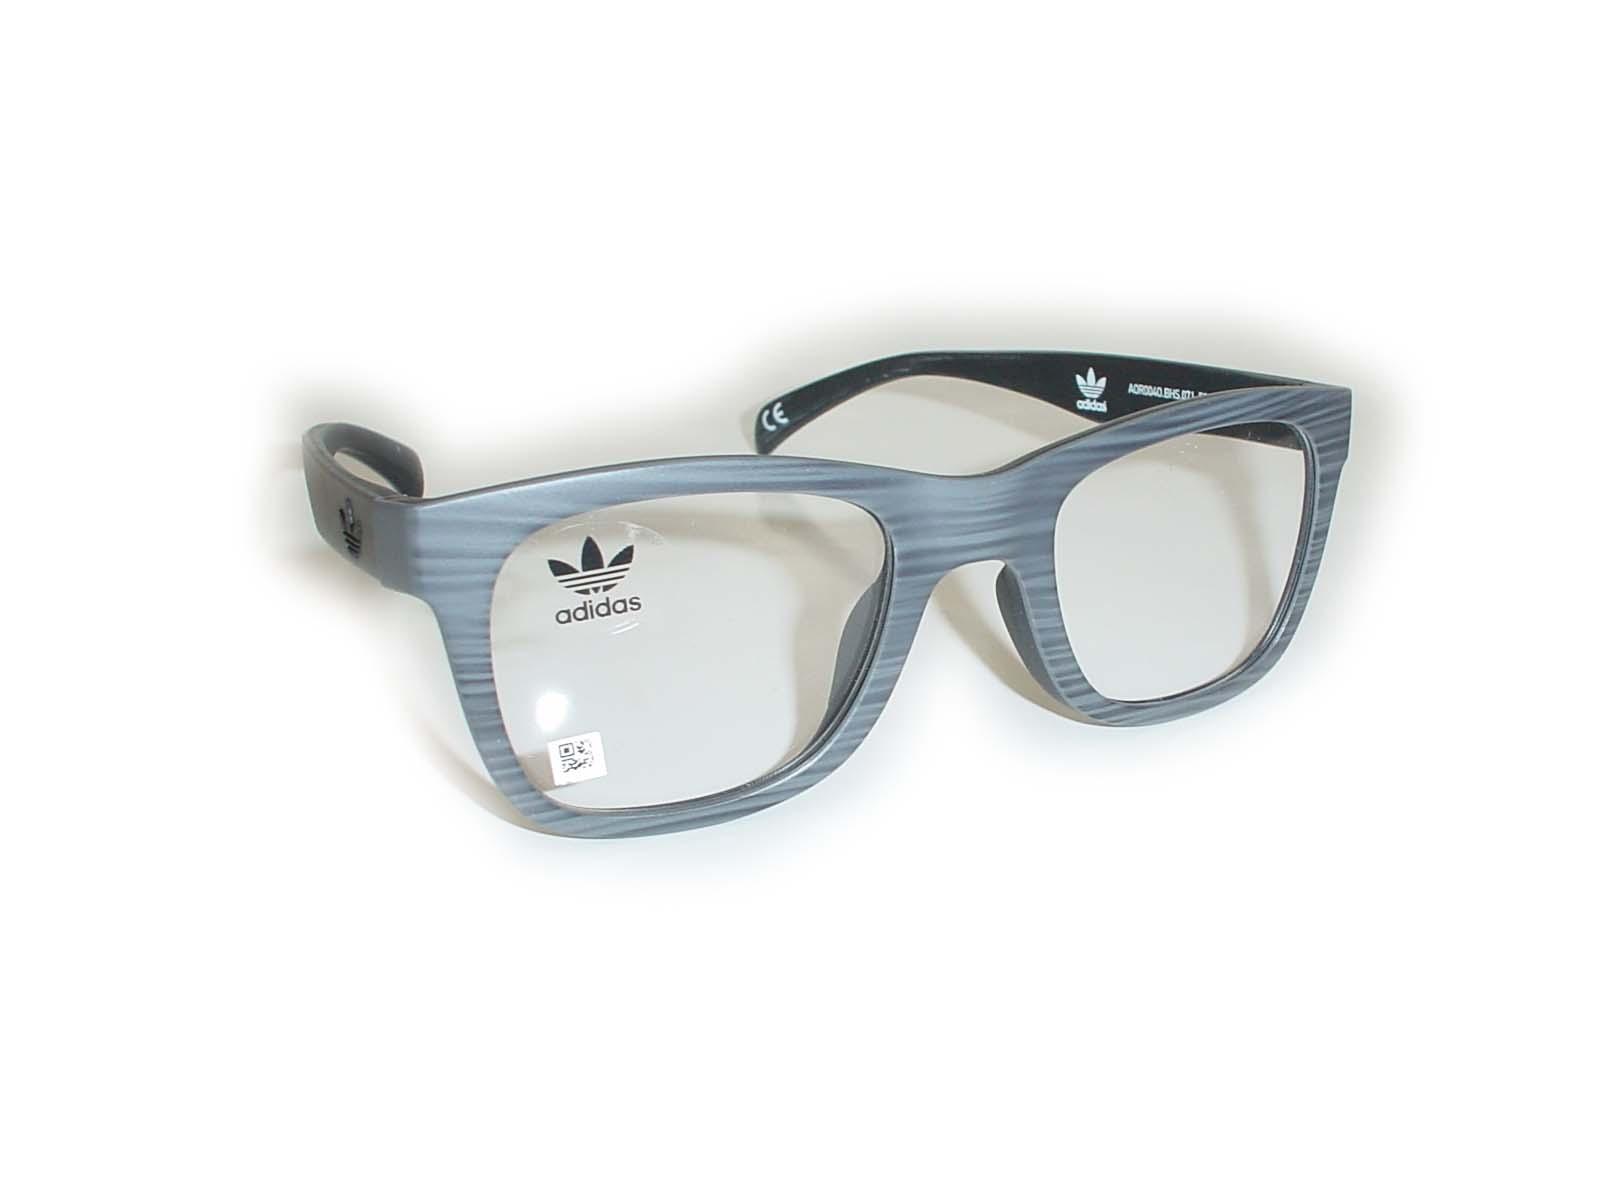 ★adidas(アディダス)★AOR004050□22-140COL.BHS.071グレー超薄型非球面レンズ付